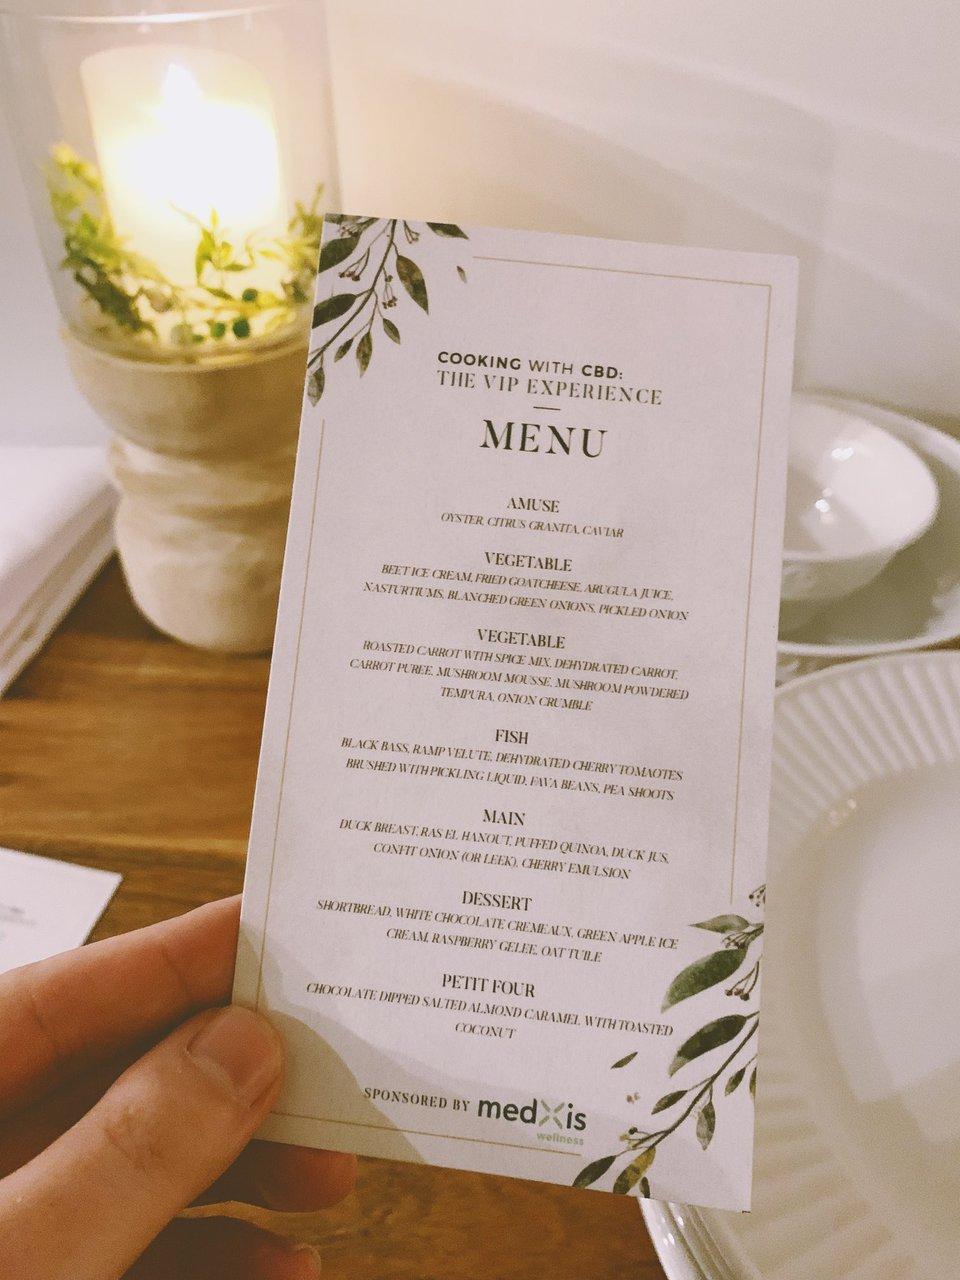 Cooking with CBD photo menu.jpg